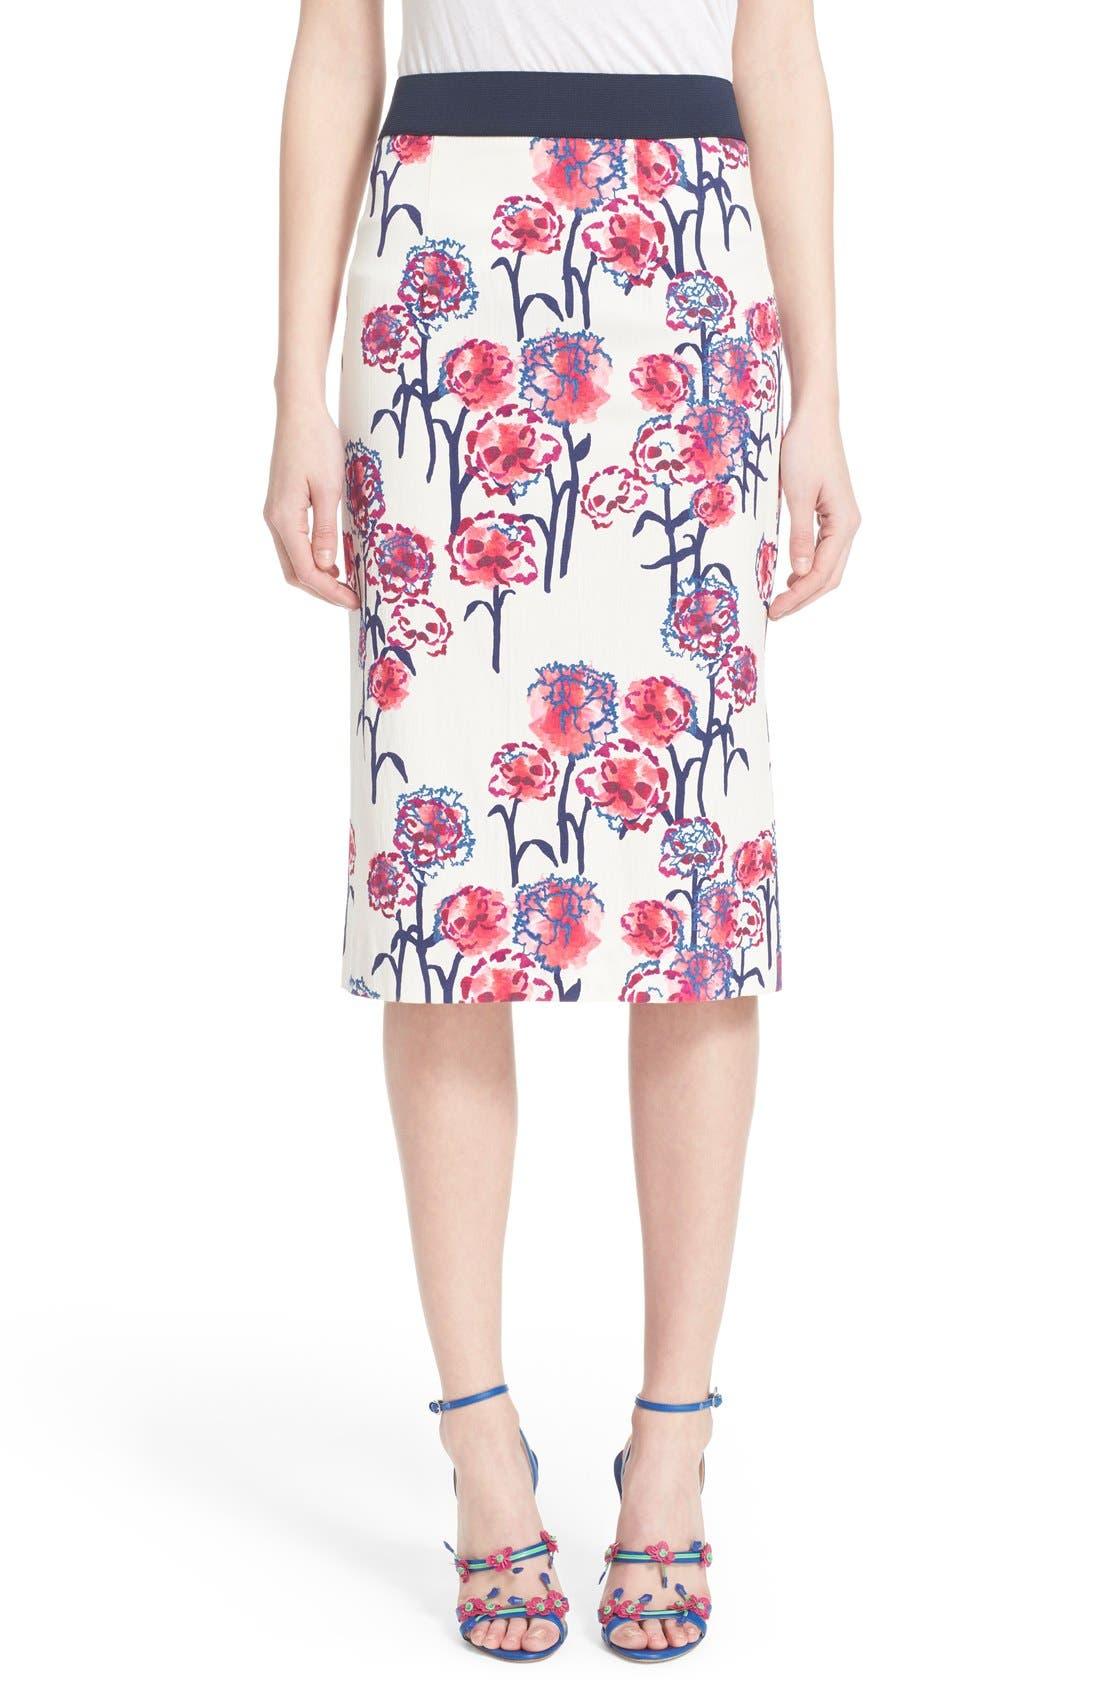 Alternate Image 1 Selected - Tanya Taylor Textured Garden Print Pencil Skirt